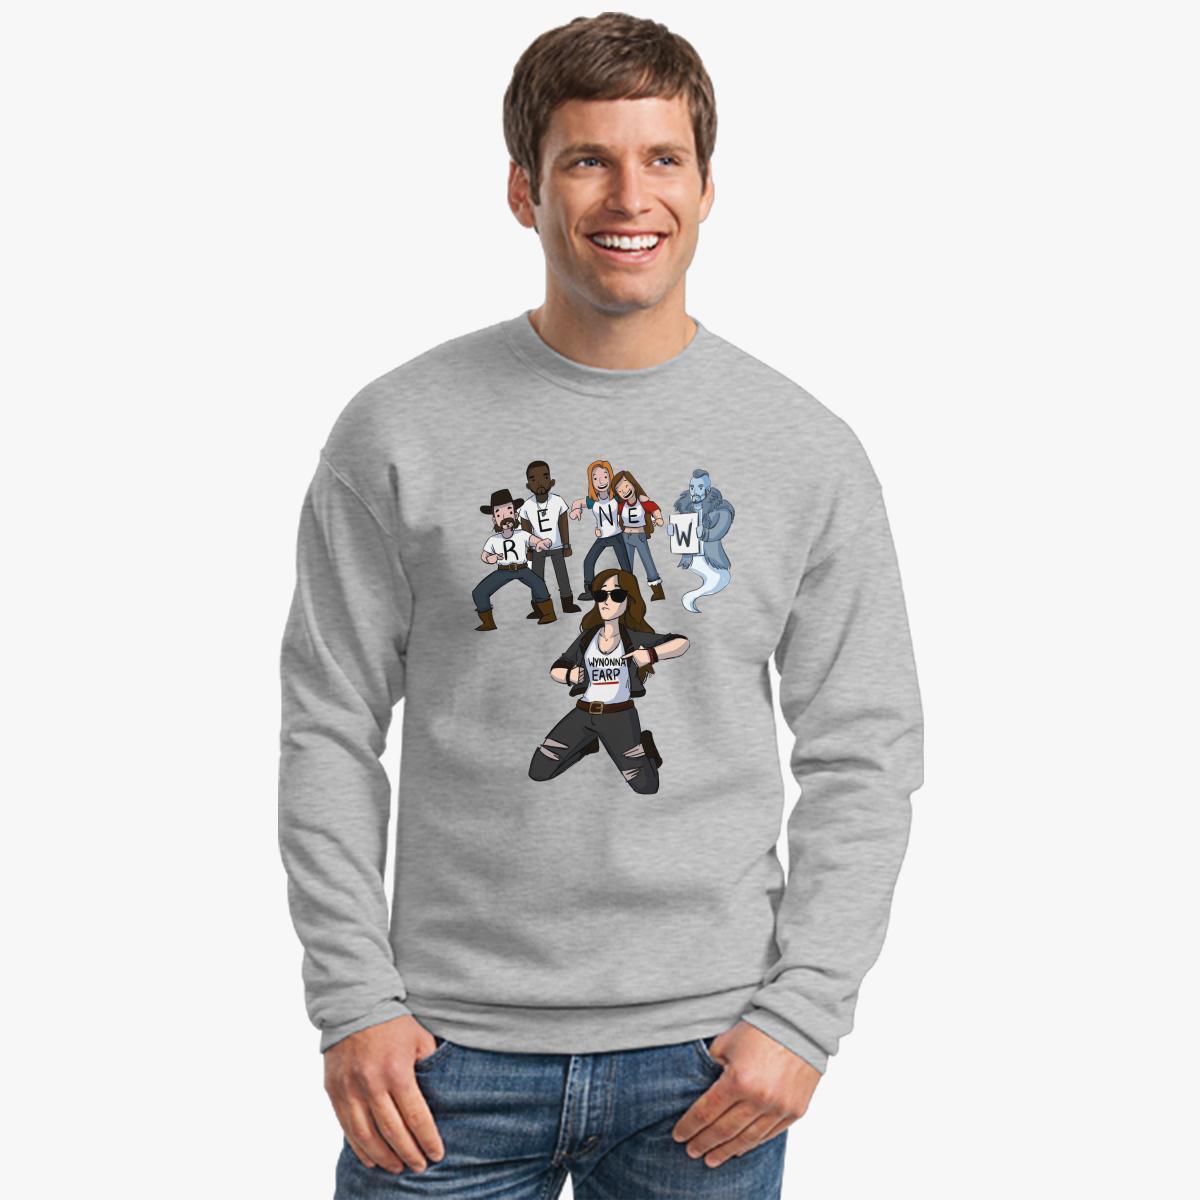 ART Crewneck Sweatshirt